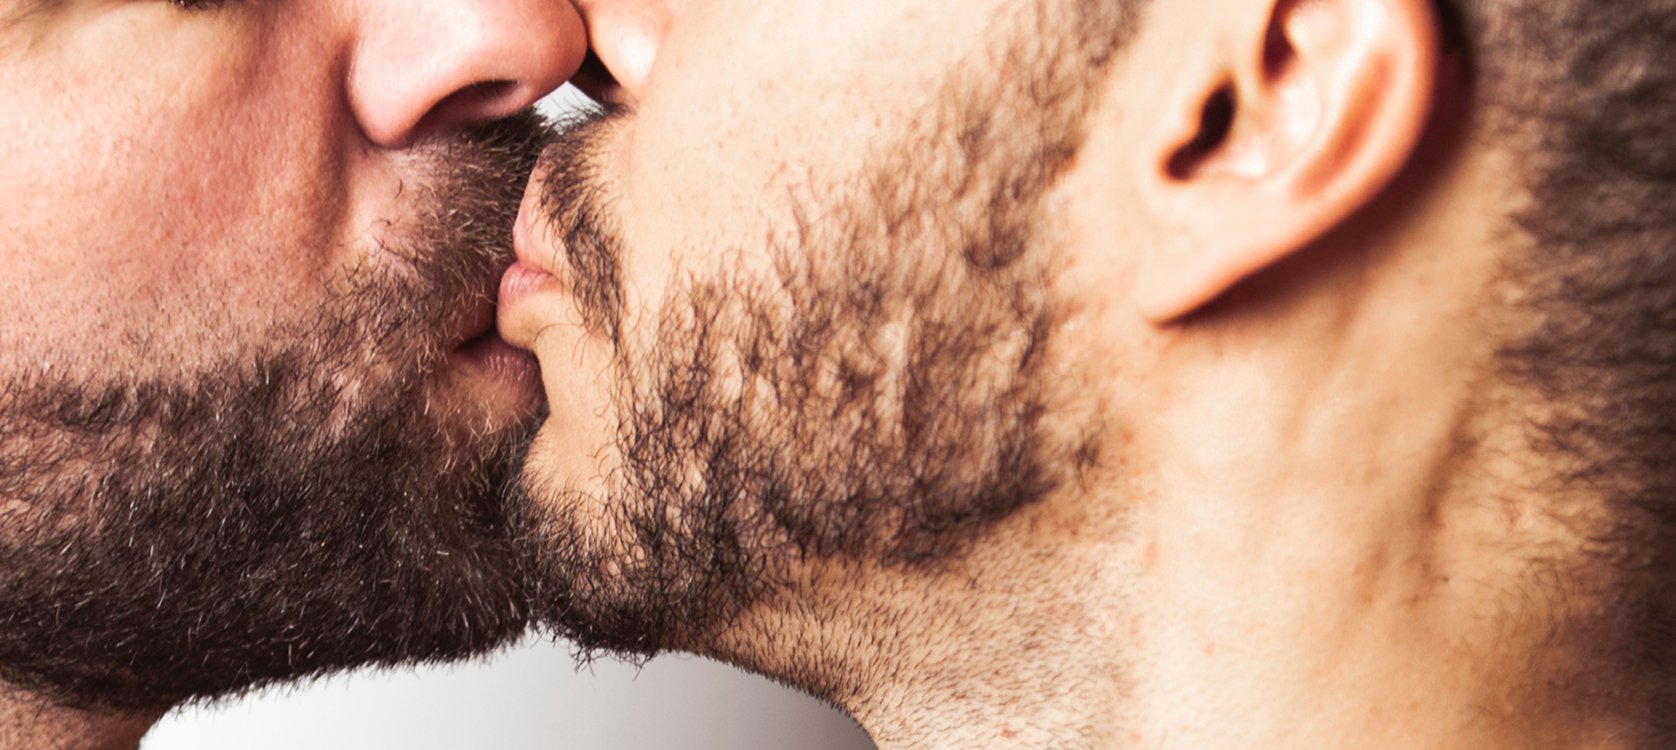 Sex & COVID Banner.jpg